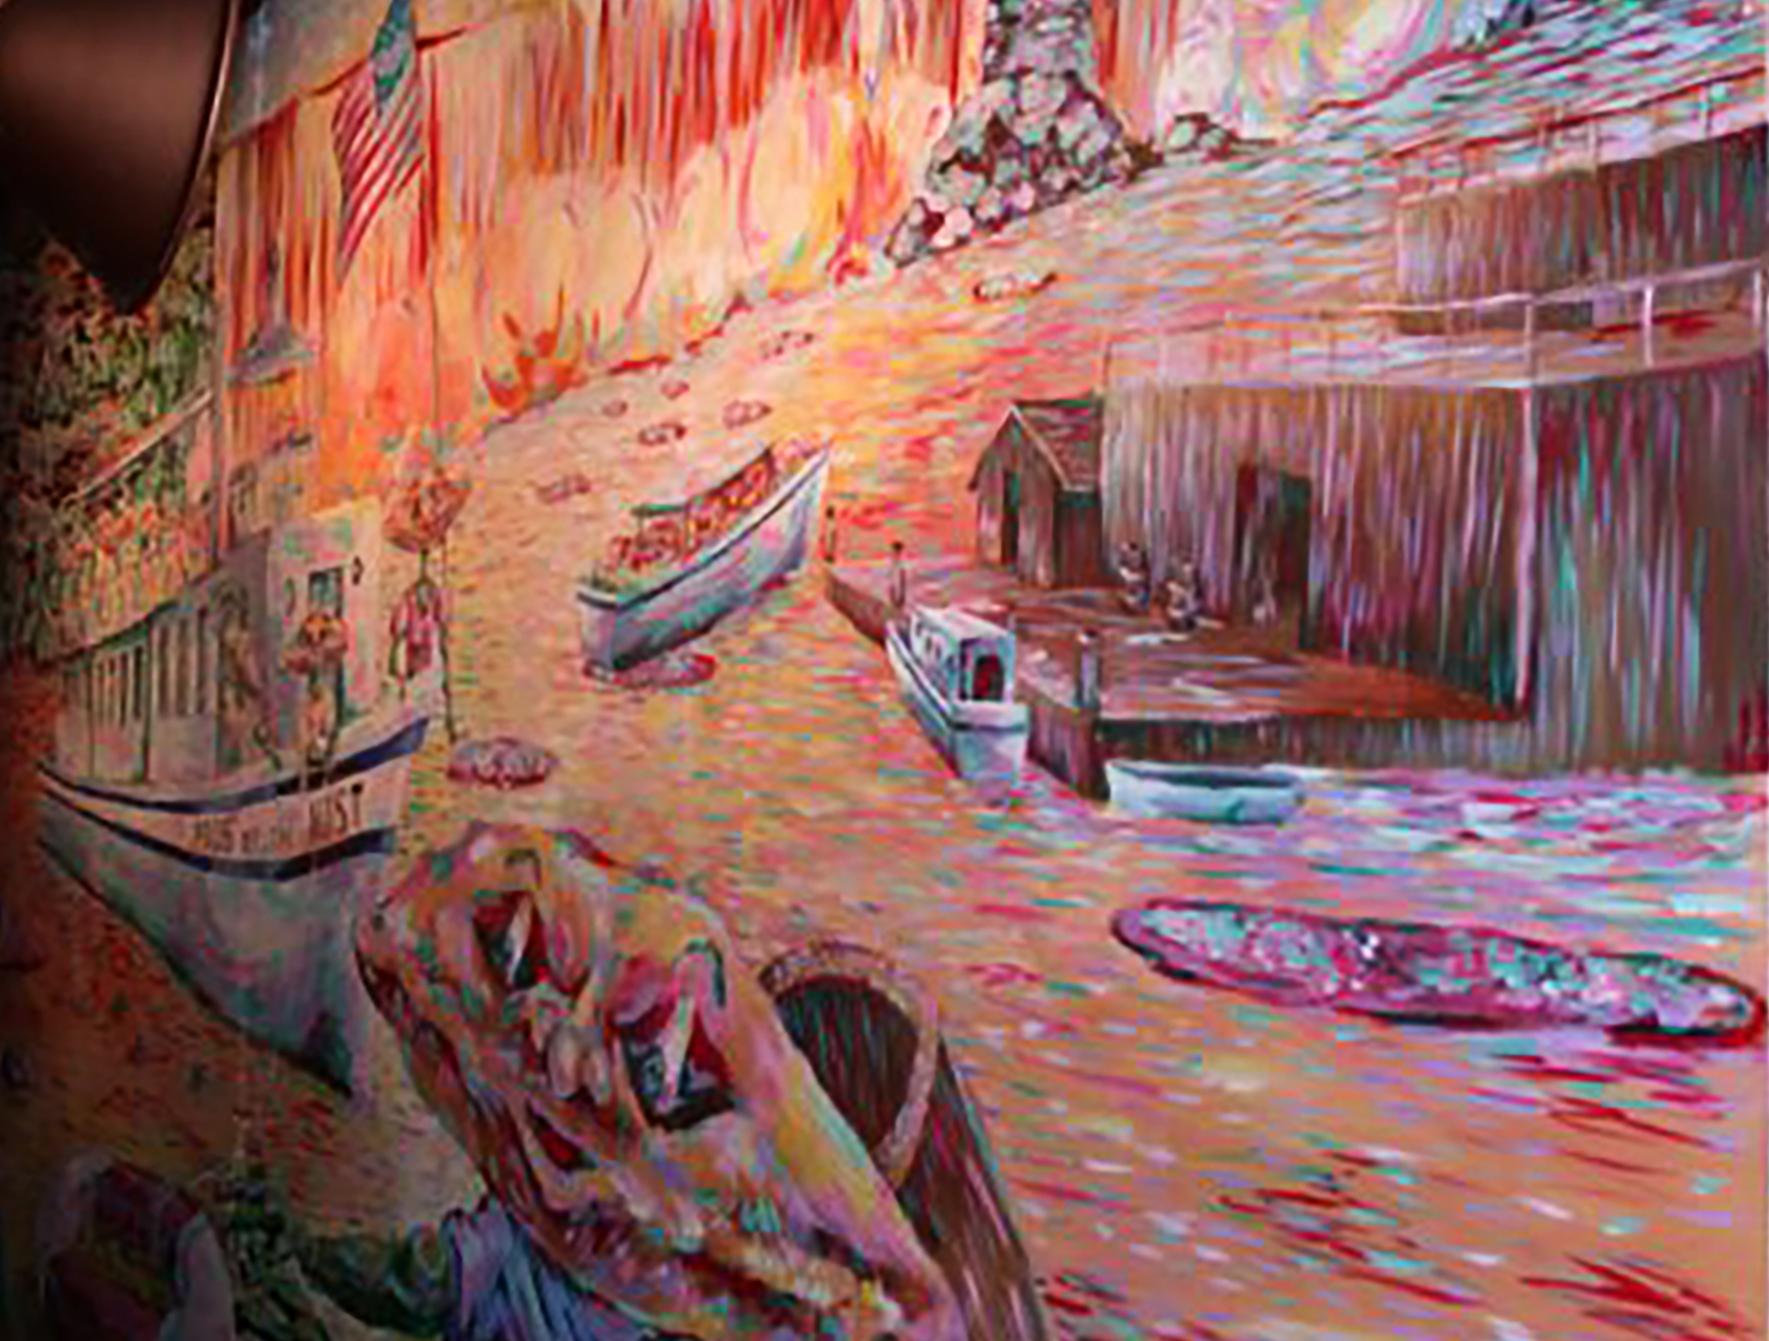 2004 // Acrylic on MDF // 5' x 9' wall mural